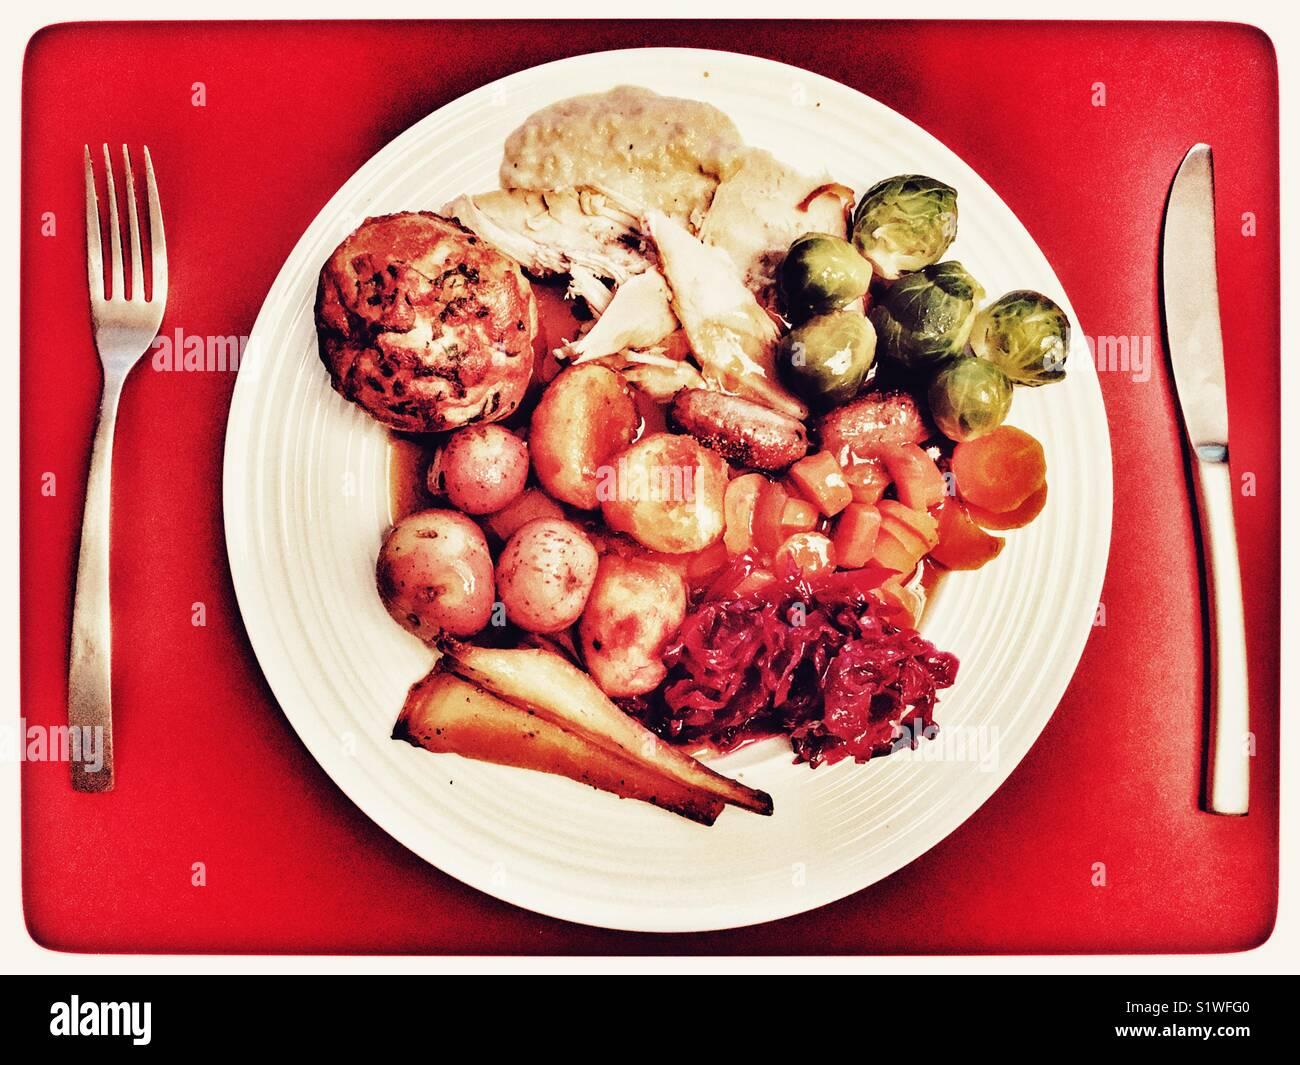 traditional british christmas dinner stock image - British Christmas Dinner